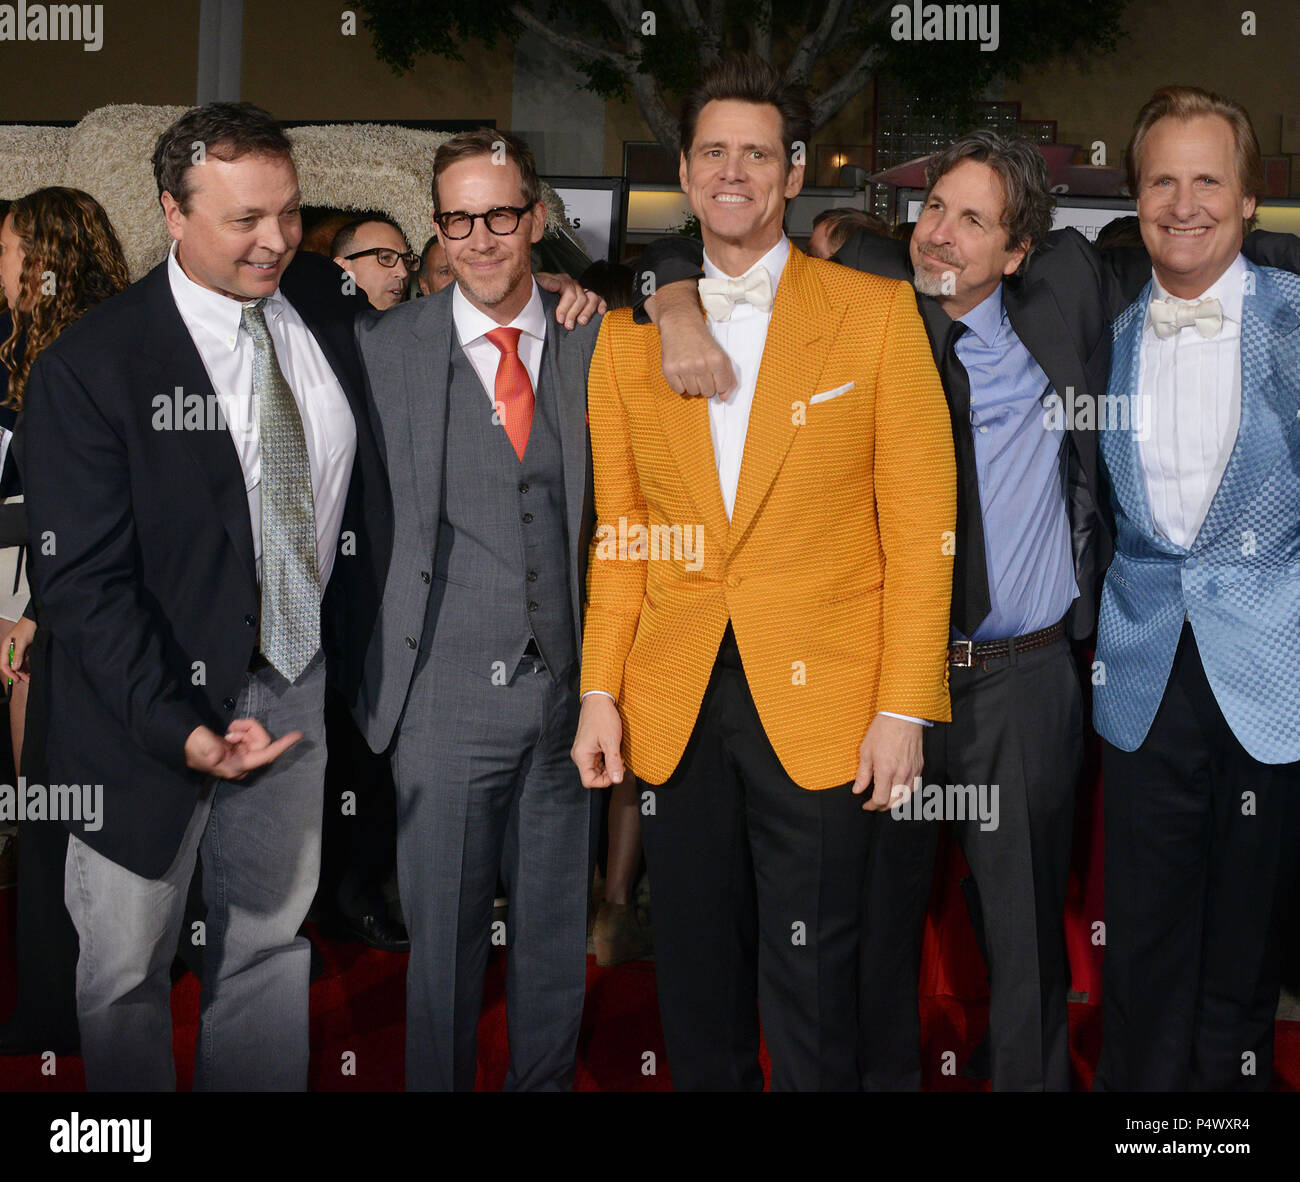 Jim Carrey, Jeff Daniels, Peter and Bobby Farrelly 173 at